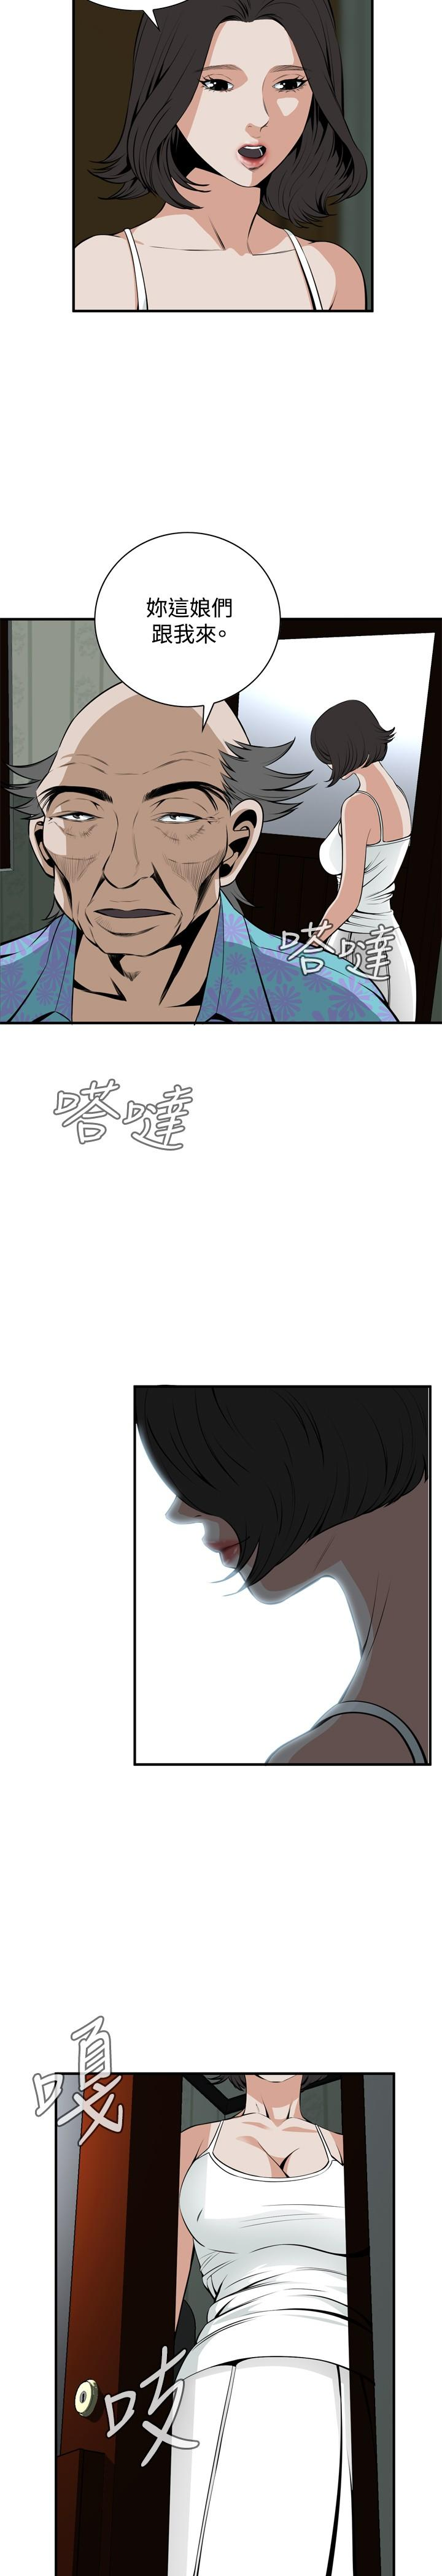 Take a Peek 偷窥 Ch.39~55 [Chinese]中文 114